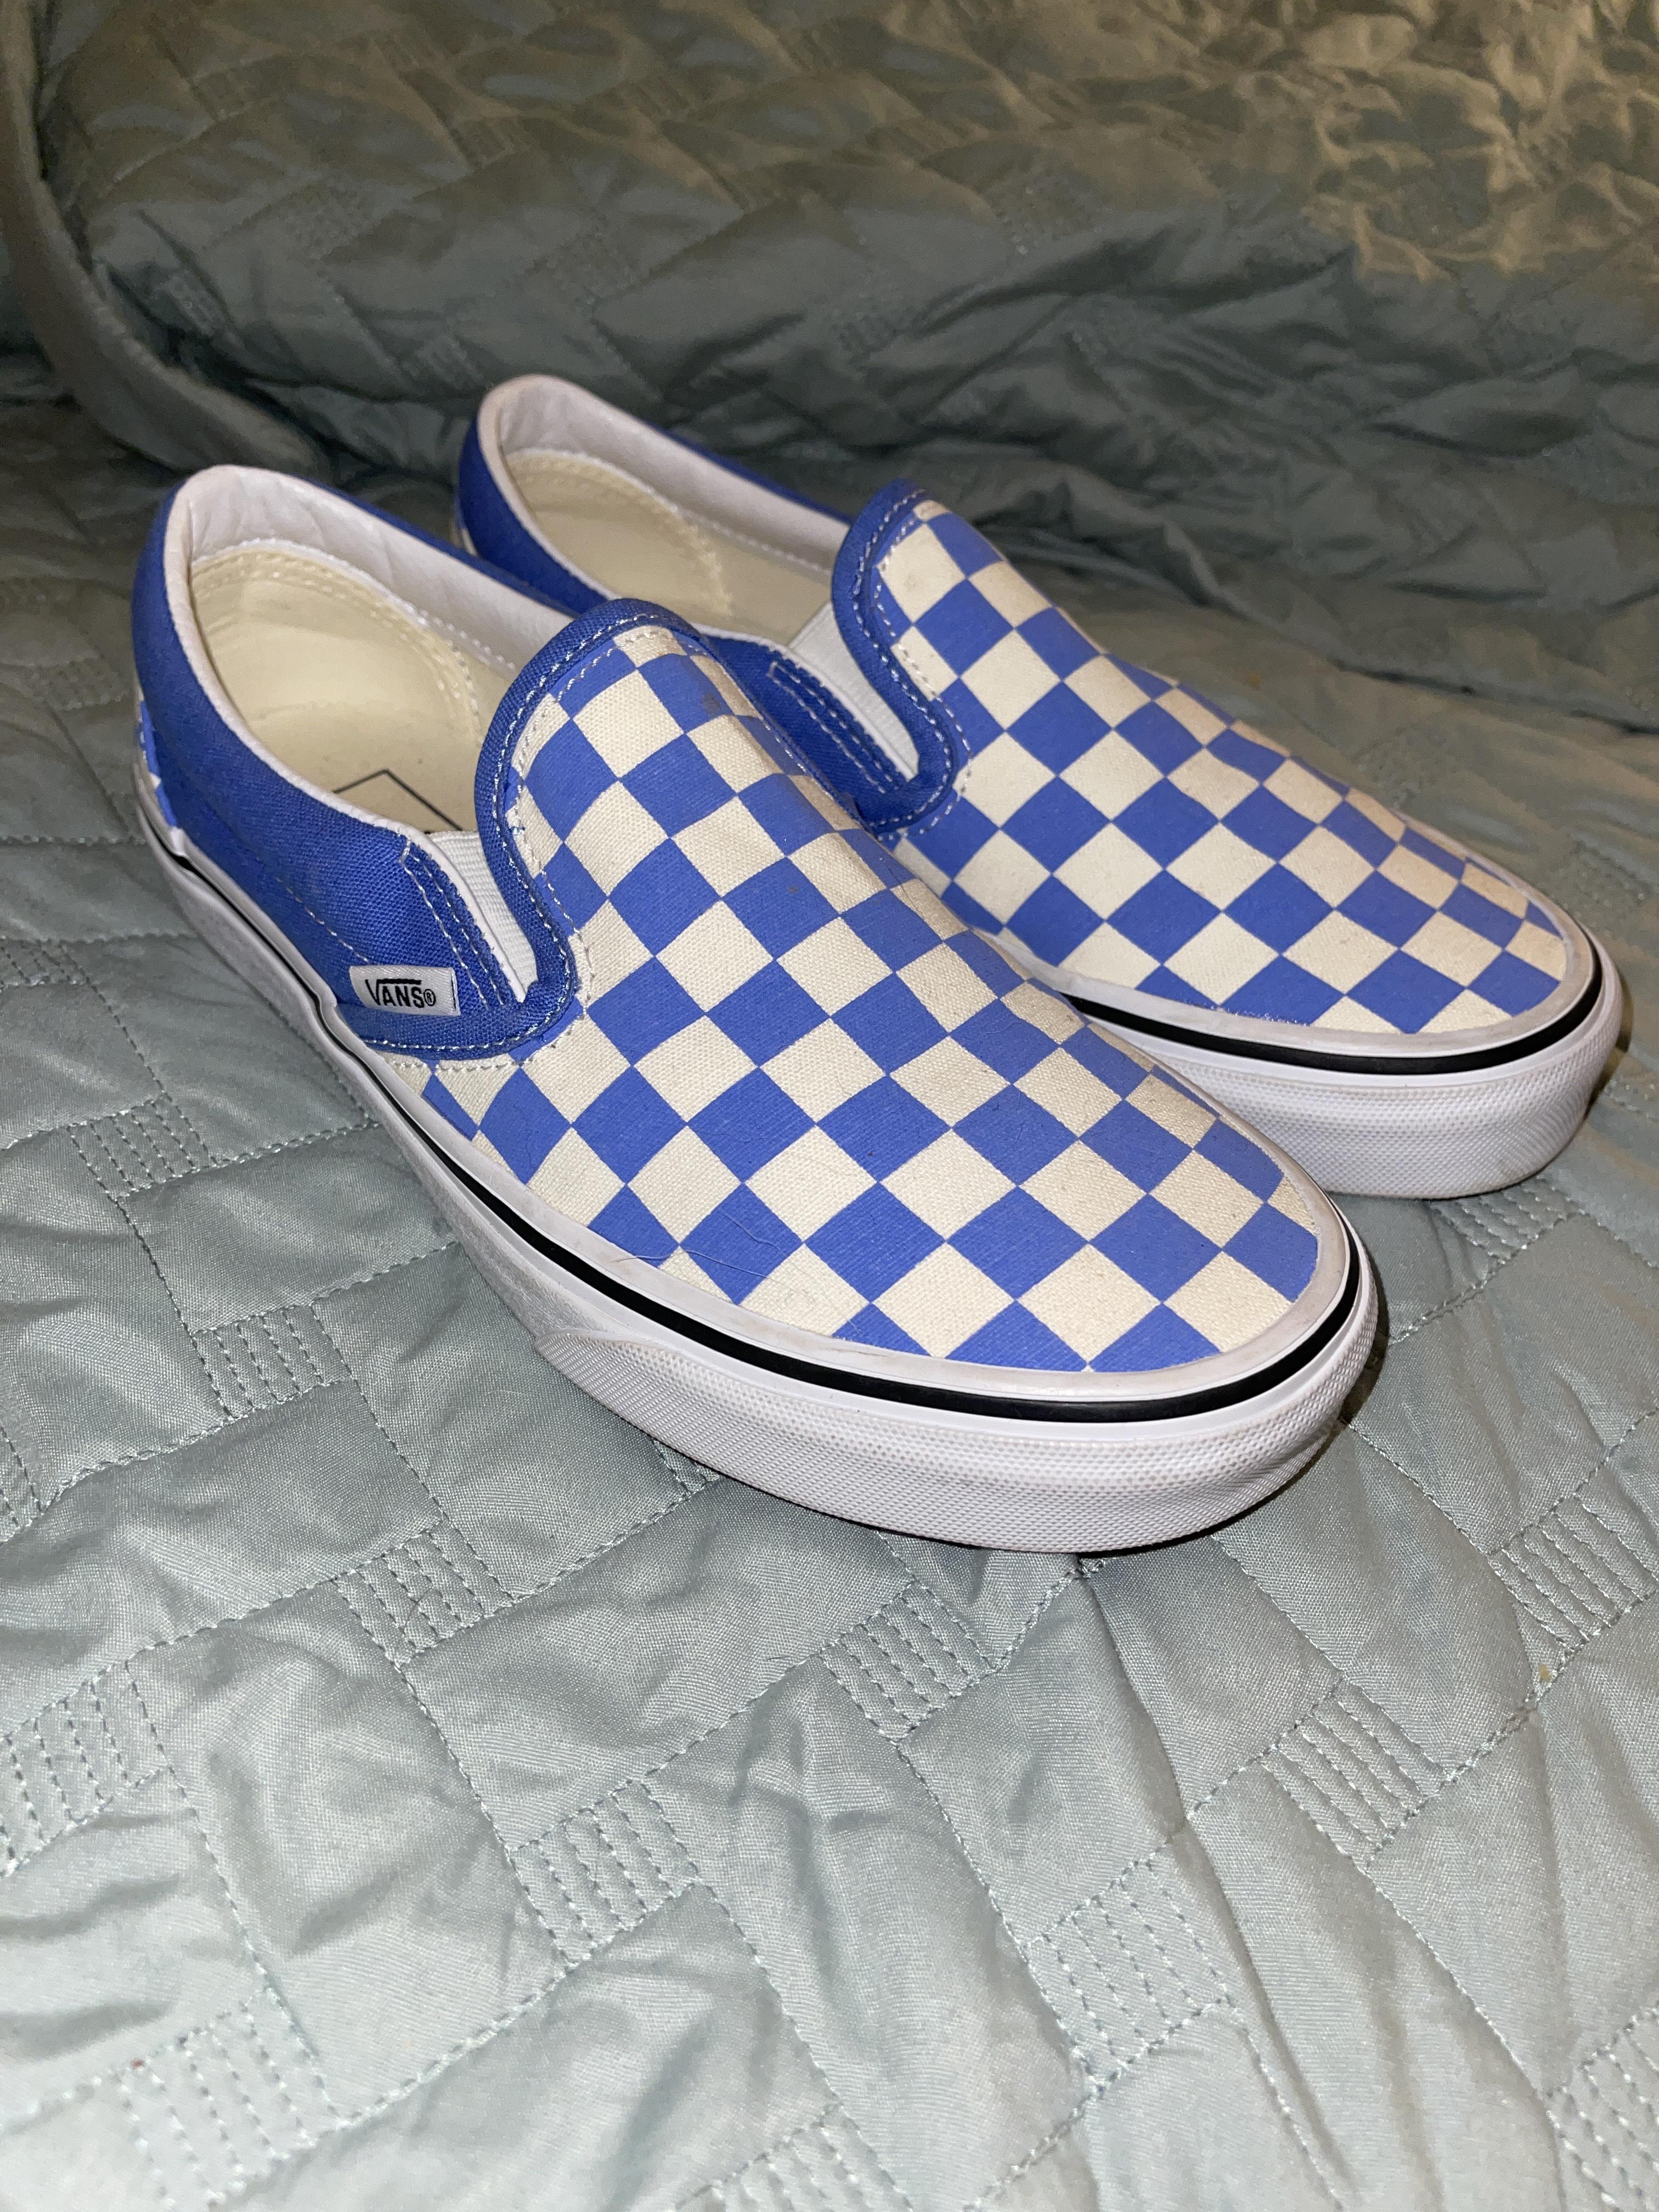 Vans - $60 - Size 7